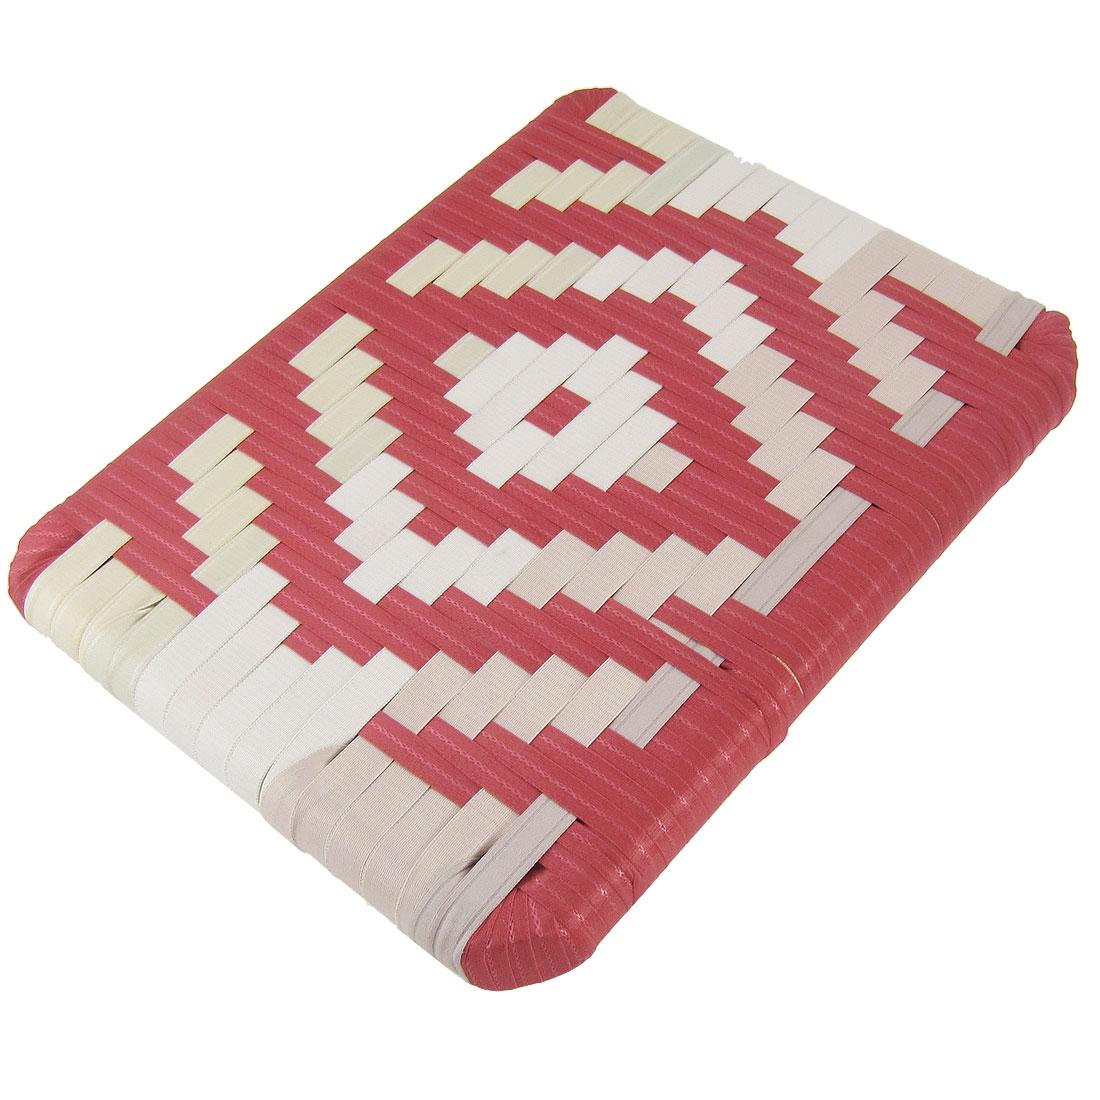 Red Ivory Band Weaved Rhombus Pattern Seat Cushion